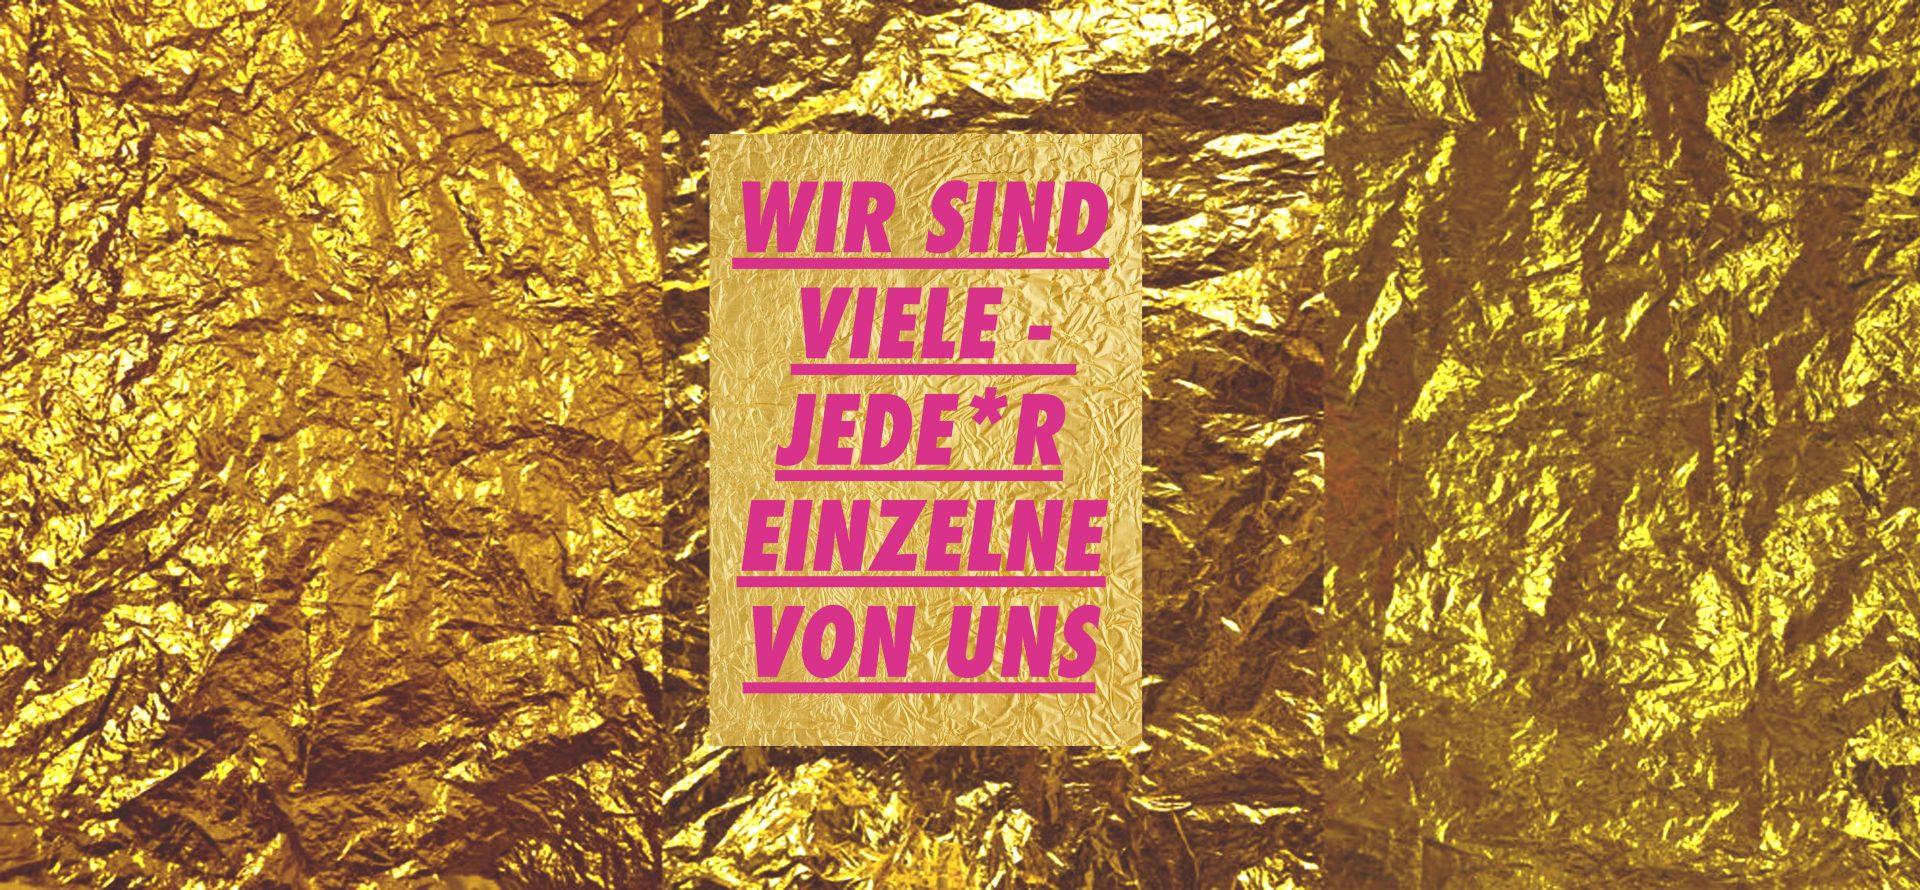 Hamburger Erklärung der Vielen HausDrei